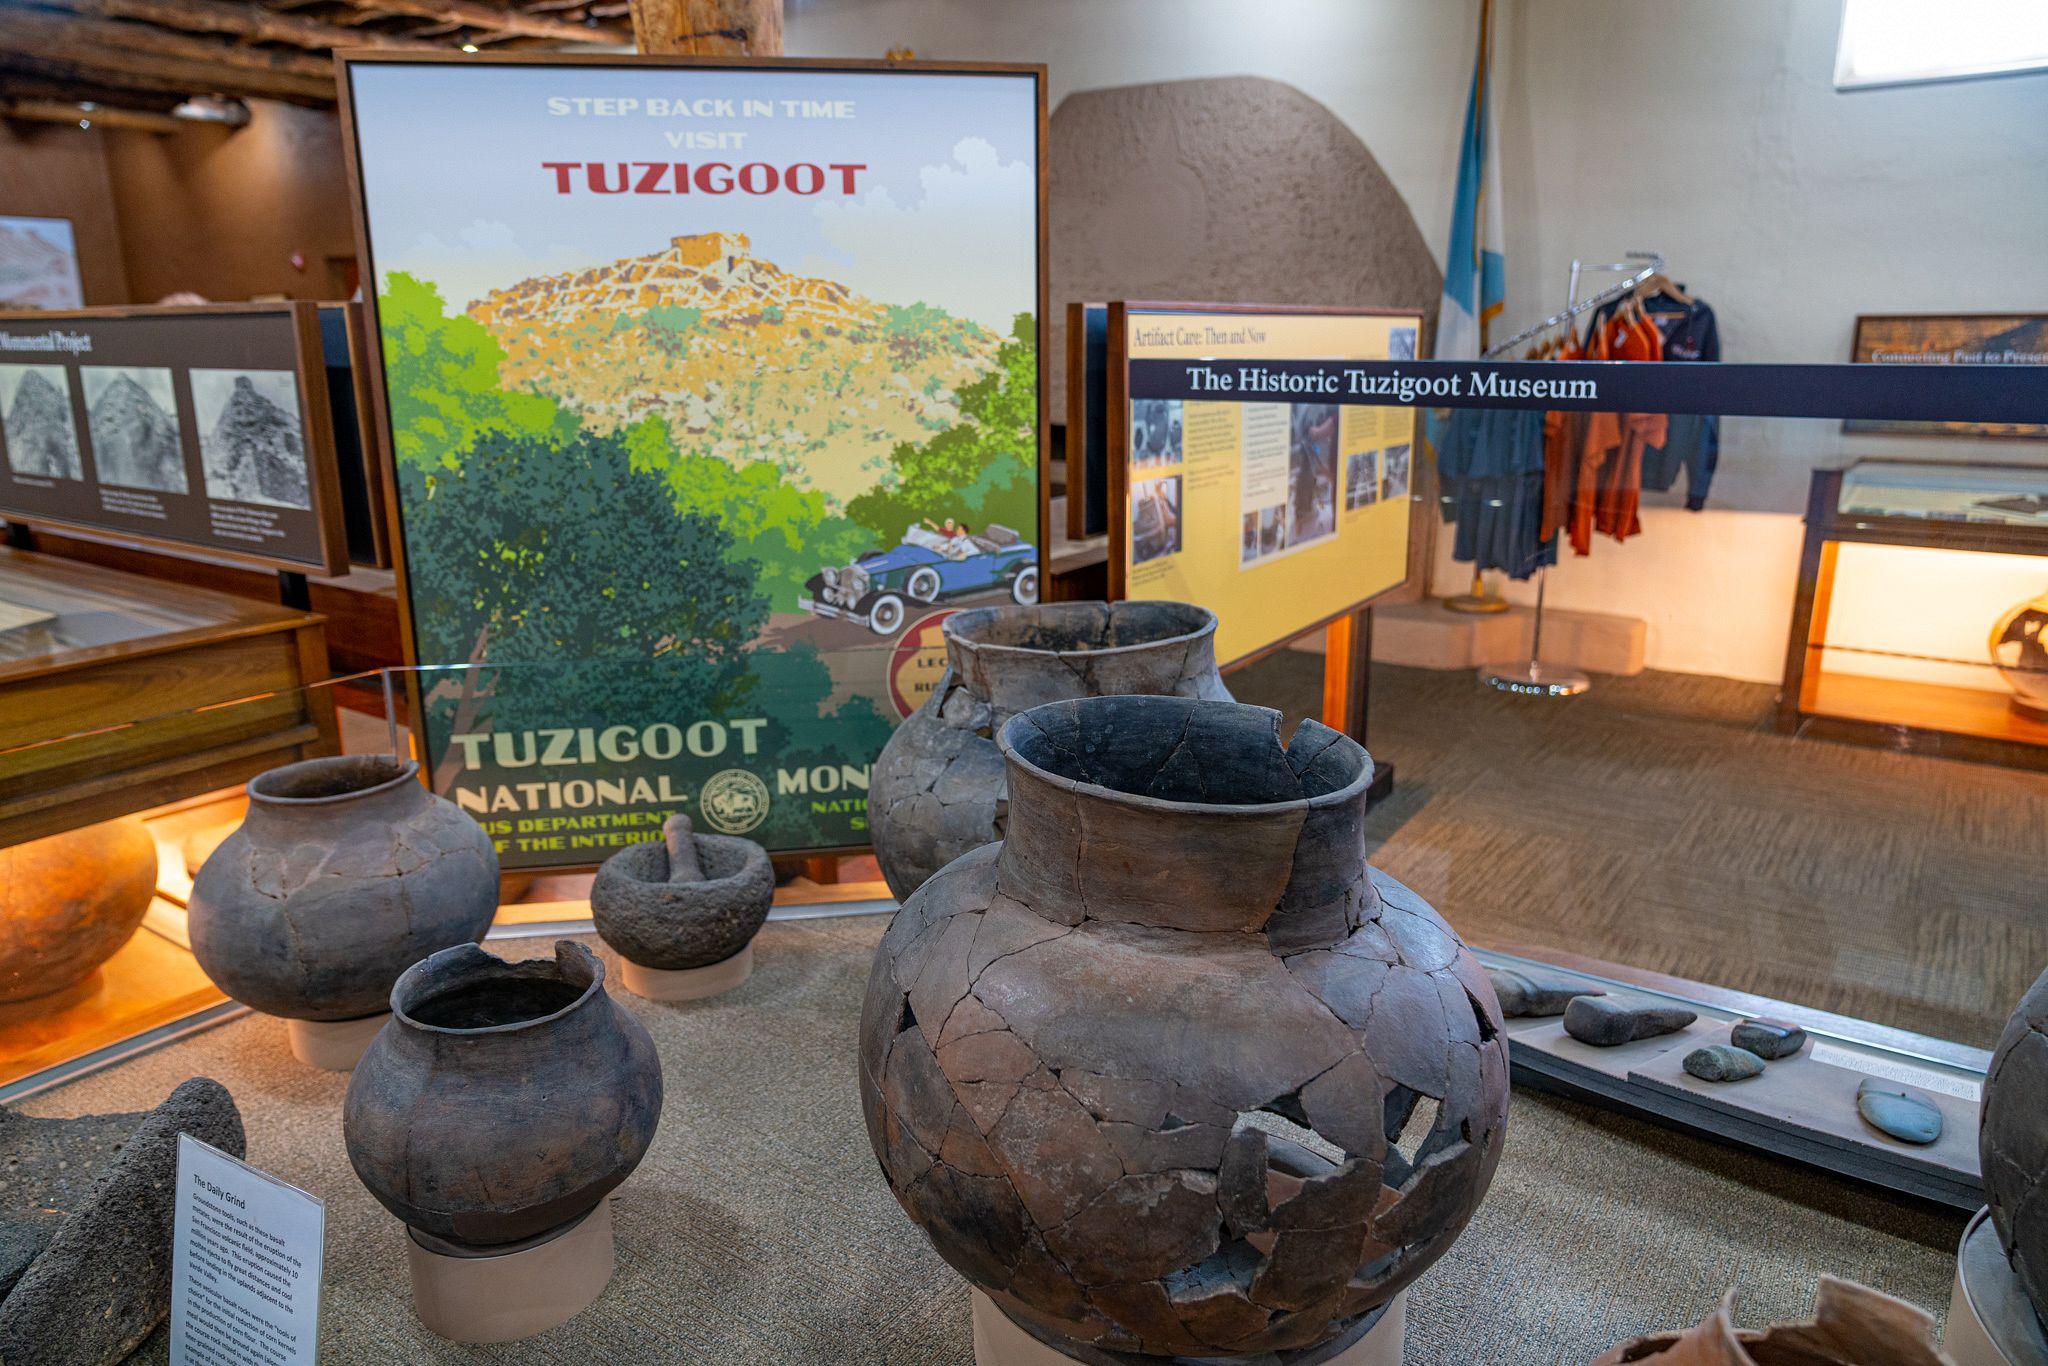 Tuzigoot Pottery Shards